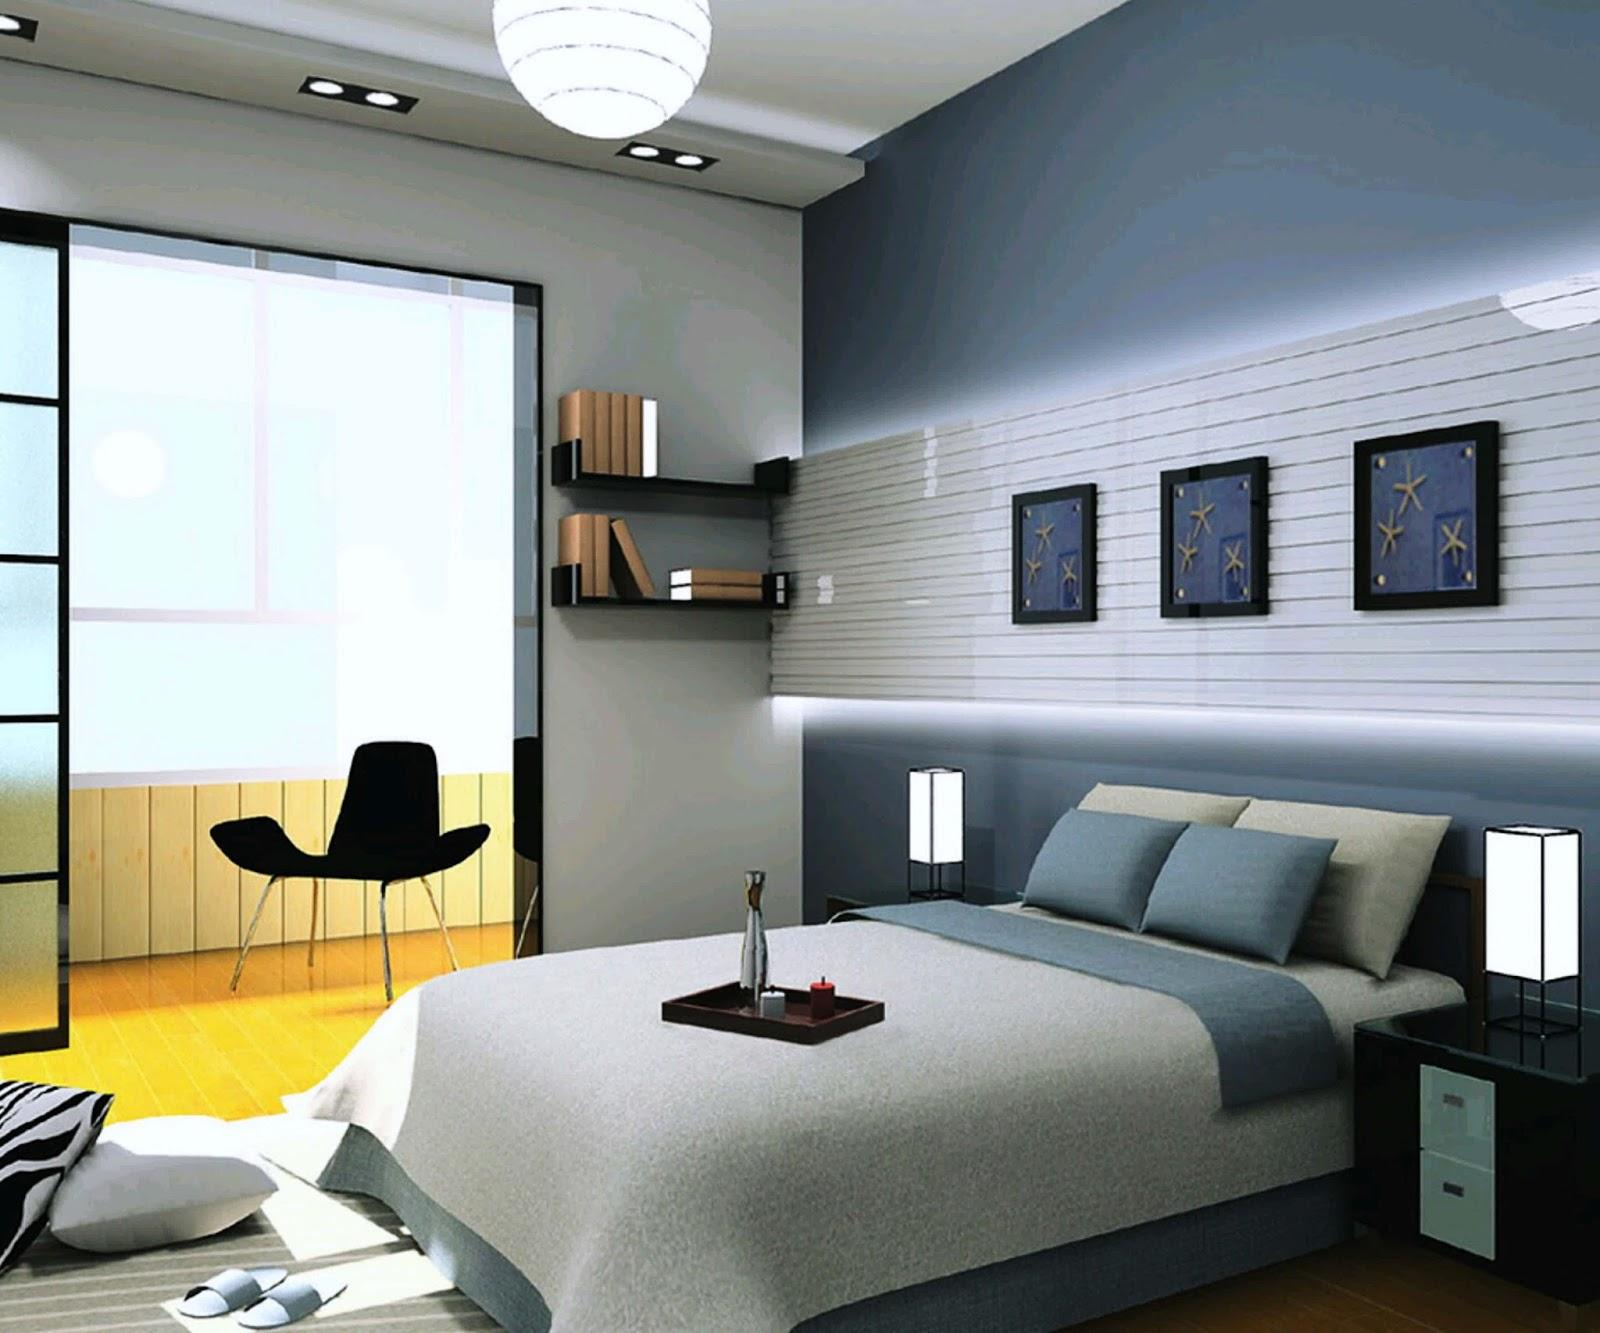 73 desain kamar tidur minimalis sederhana 2x3 3x3  3x4